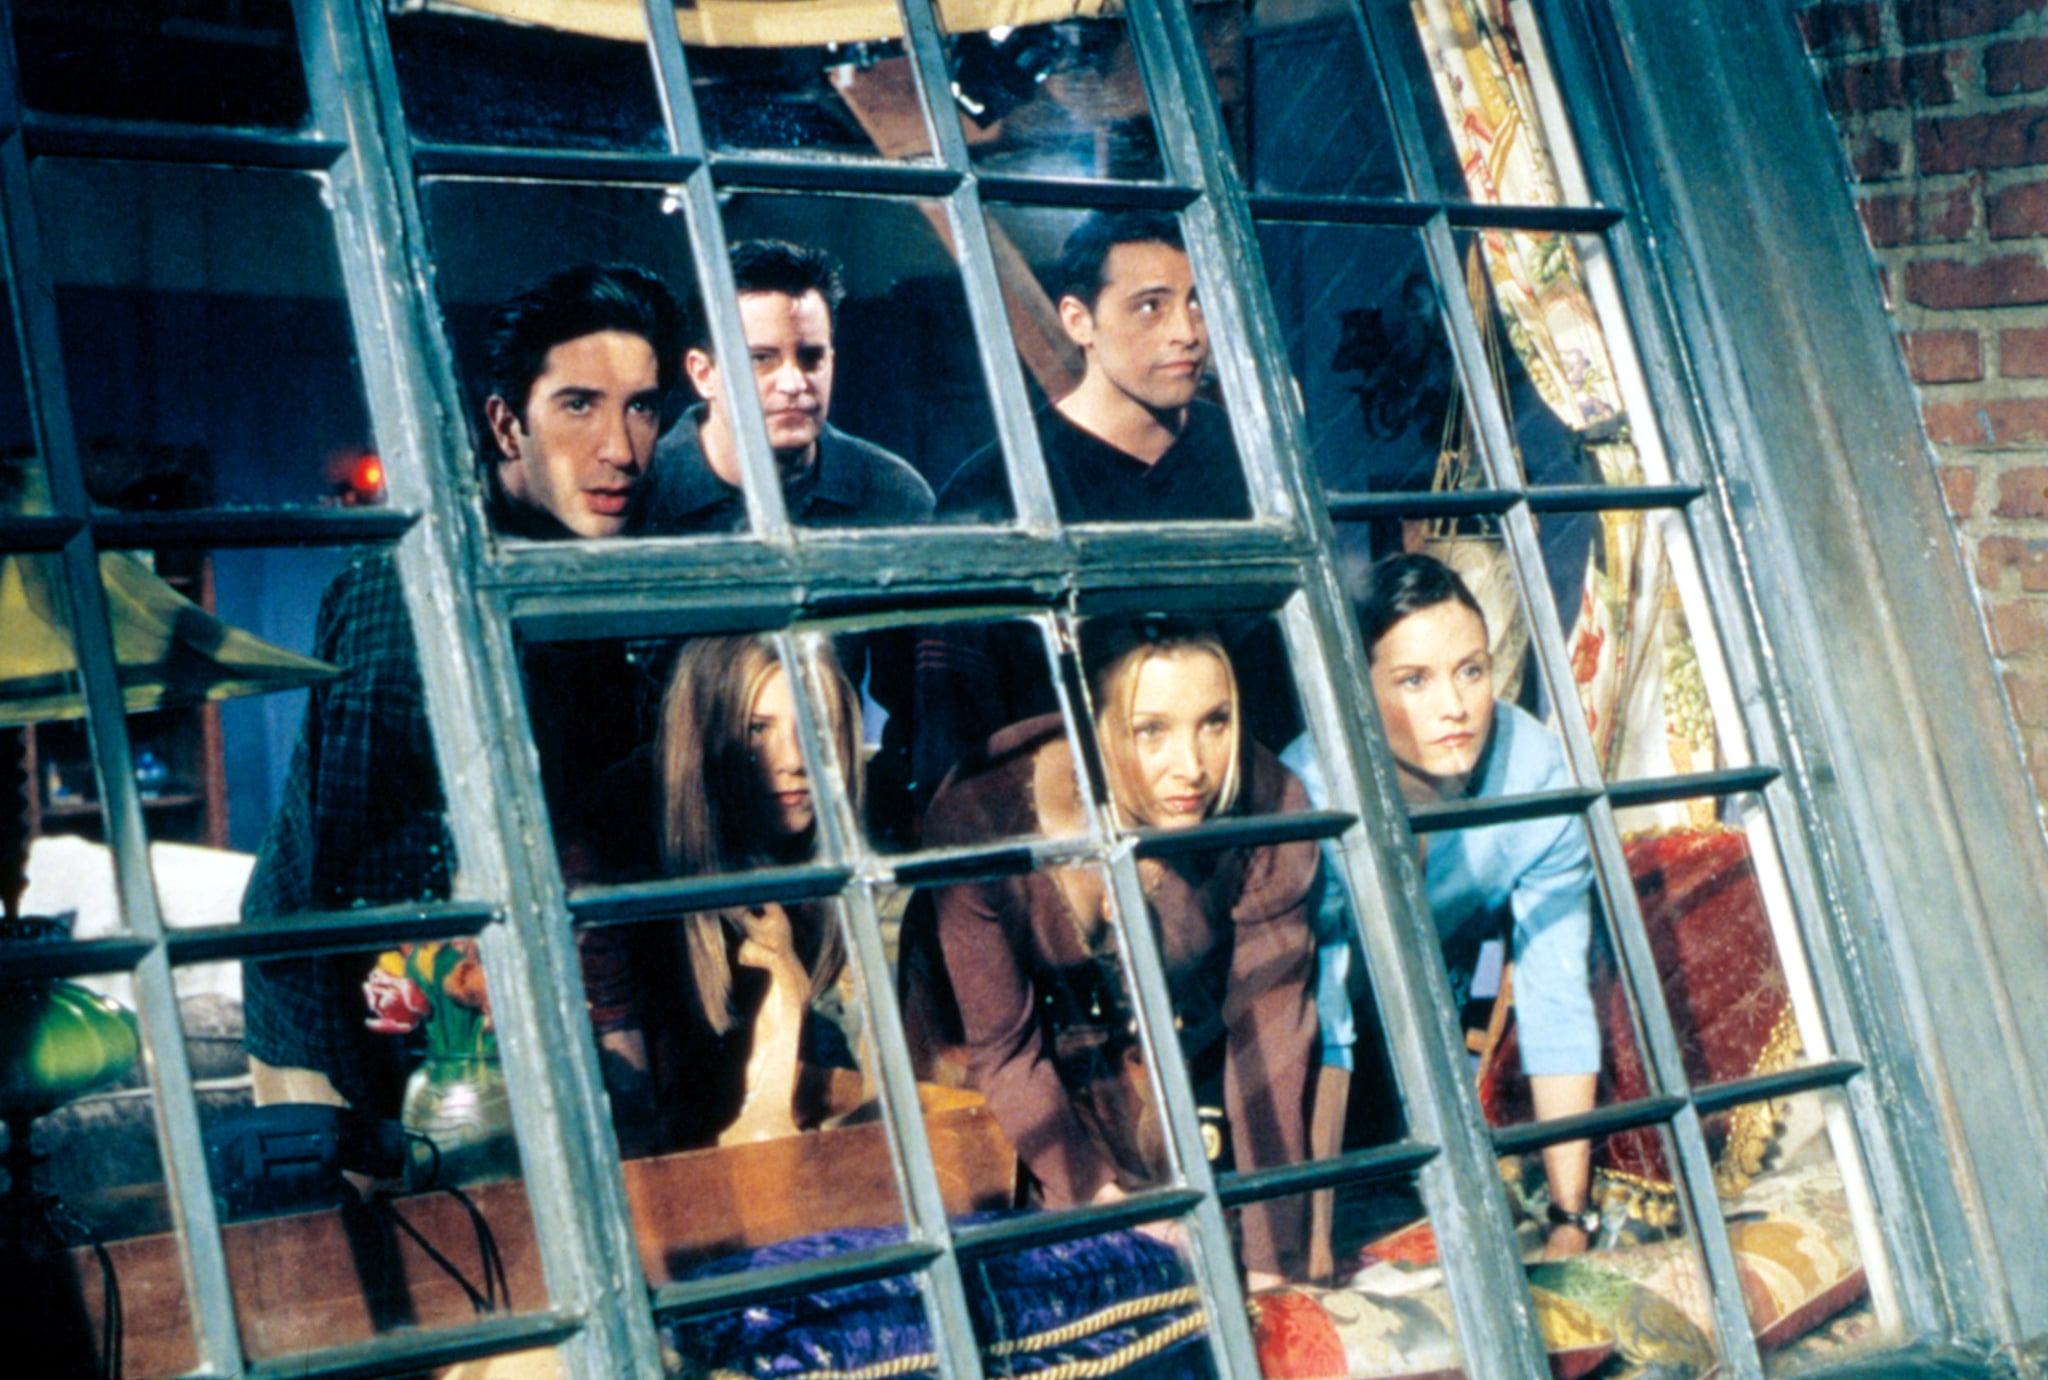 FRIENDS, David Schwimmer, Matthew Perry, Matt LeBlanc, Jennifer Aniston, Lisa Kudrow, Courteney Cox, 'The One Where Everybody Finds Out', Season 5, ep. 14, 1994-2004,  Warner Bros. / Courtesy: Everett Collection